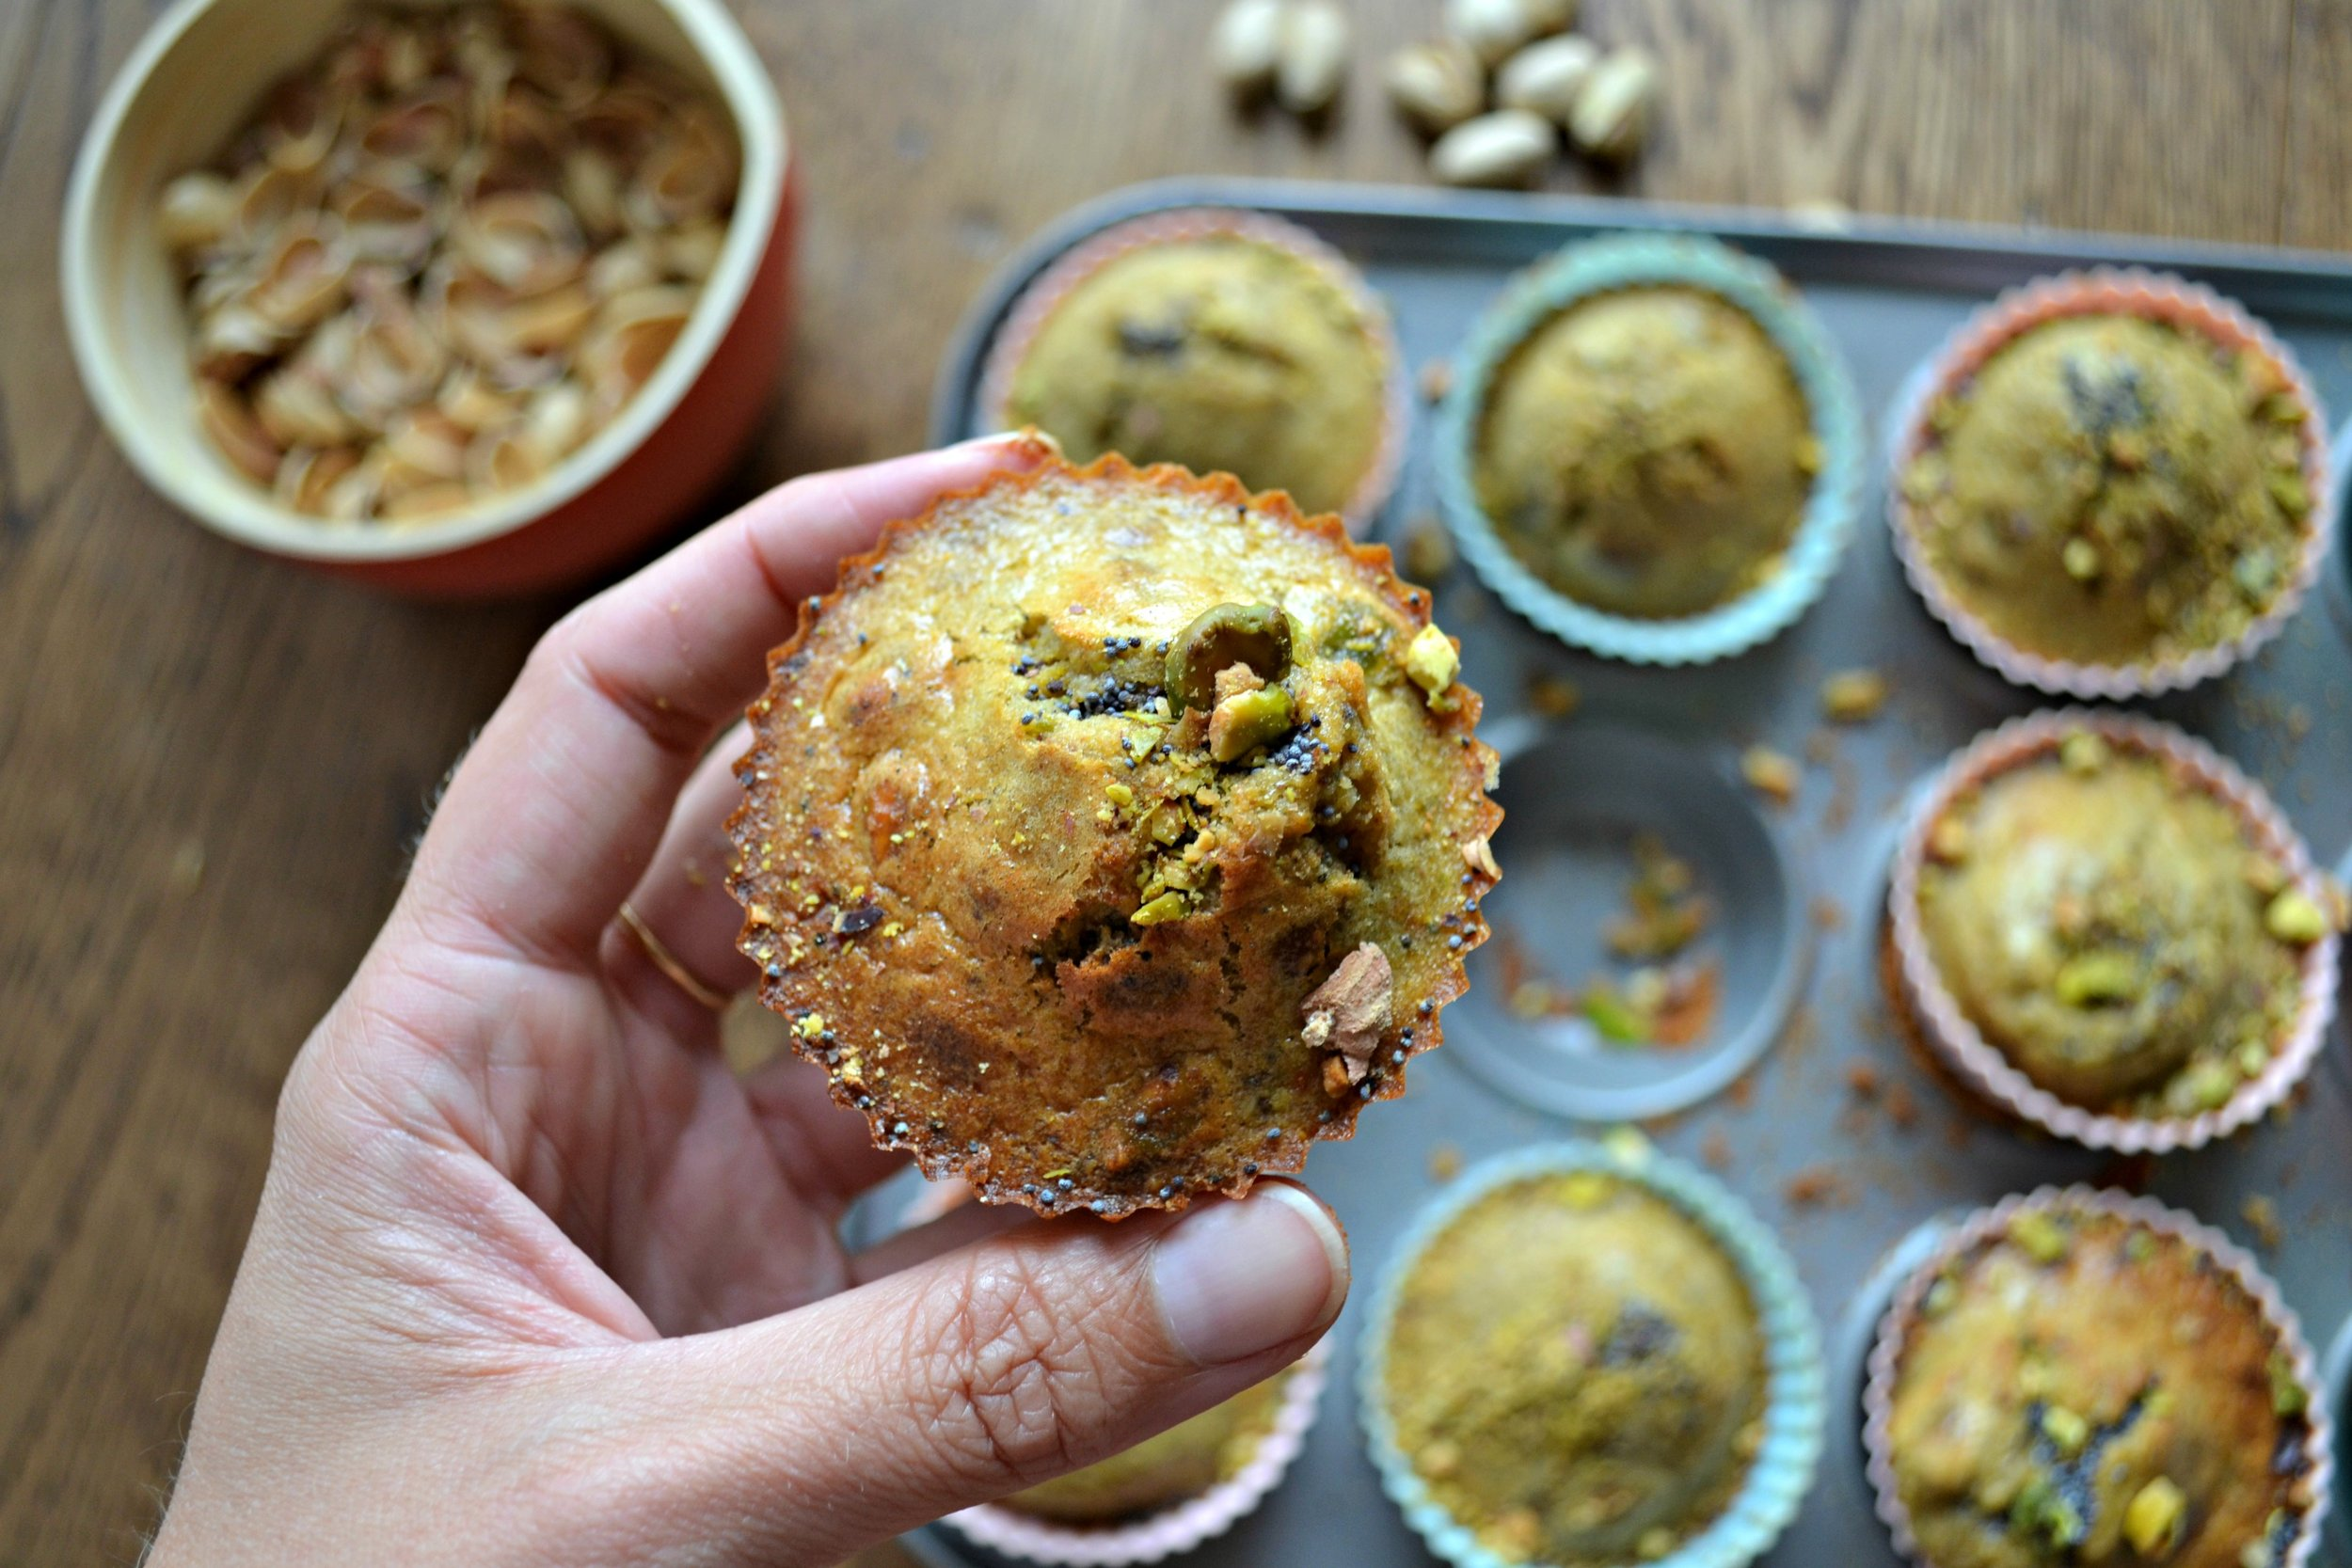 Pistachio and orange muffins | The Flourishing Pantry